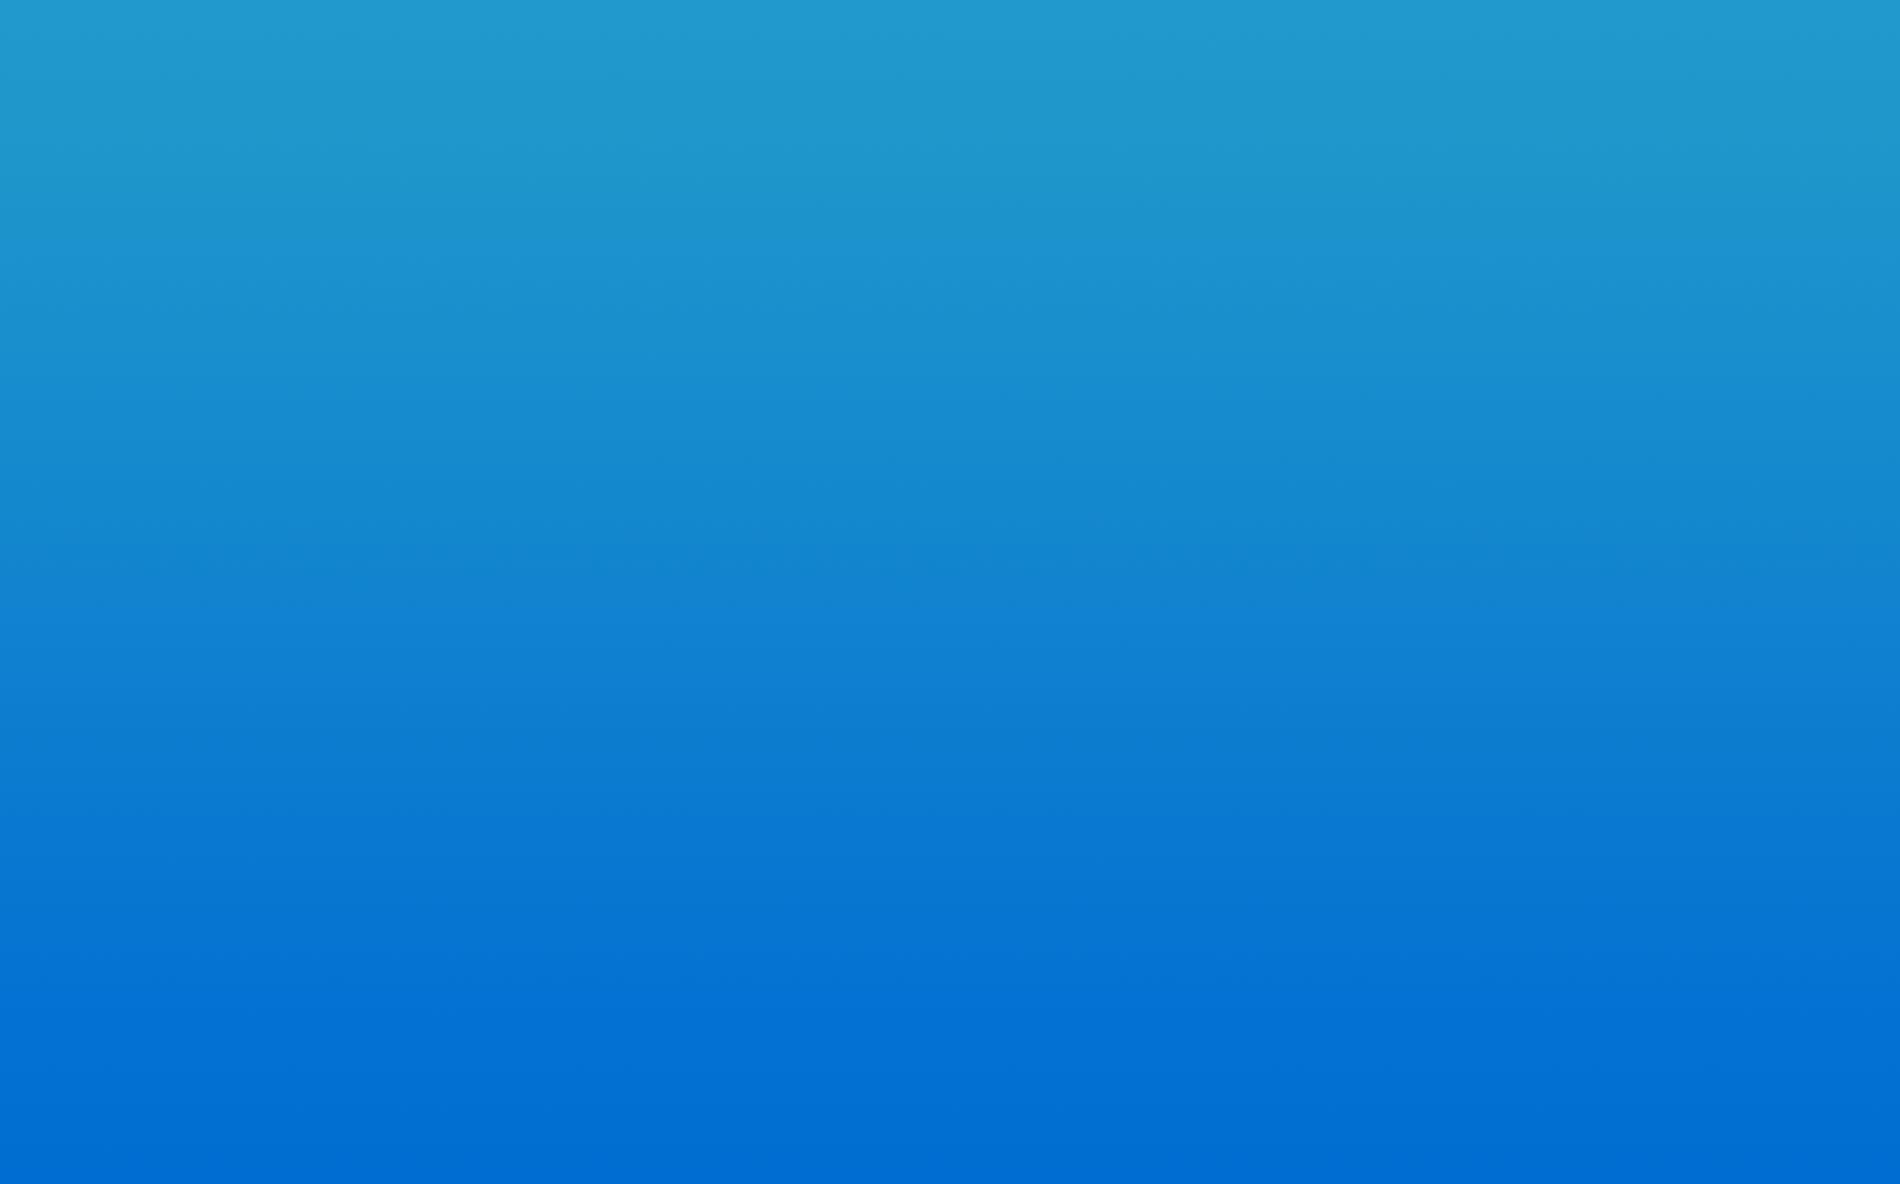 bg-gradient-blue-2-blue-1900x1184